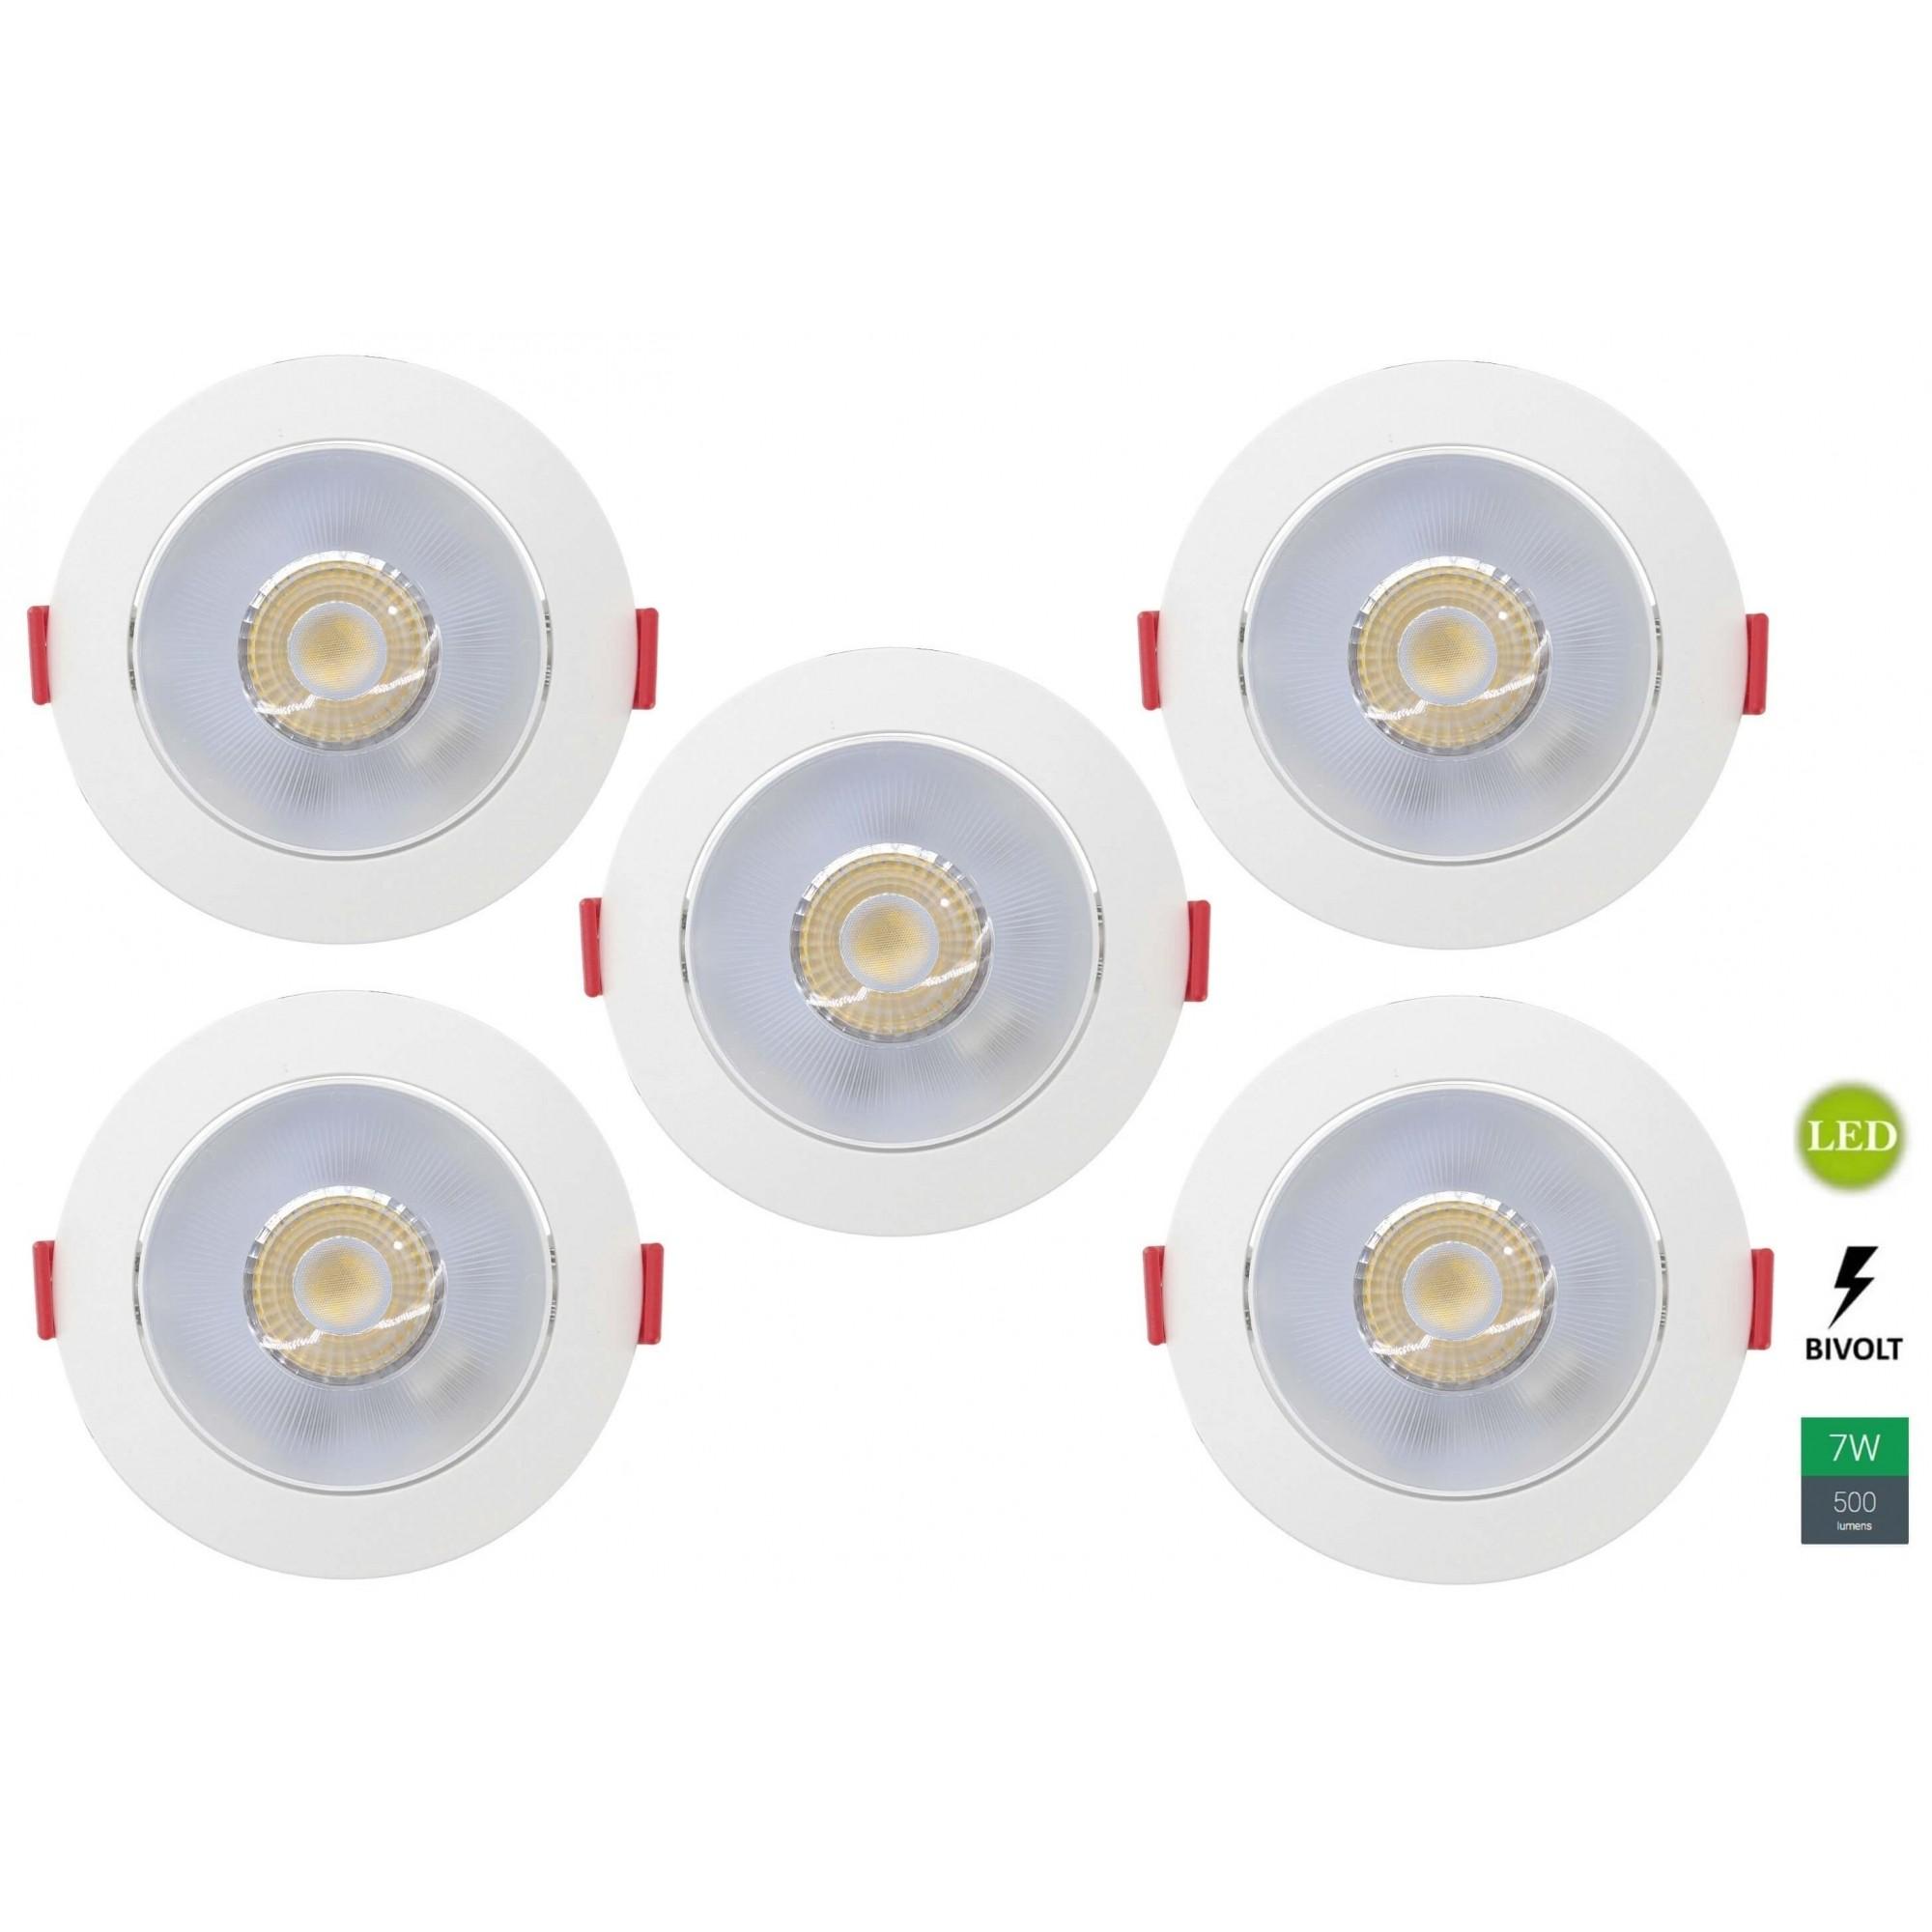 Kit 5 Spots Embutir 7w Redondo Branco Frio